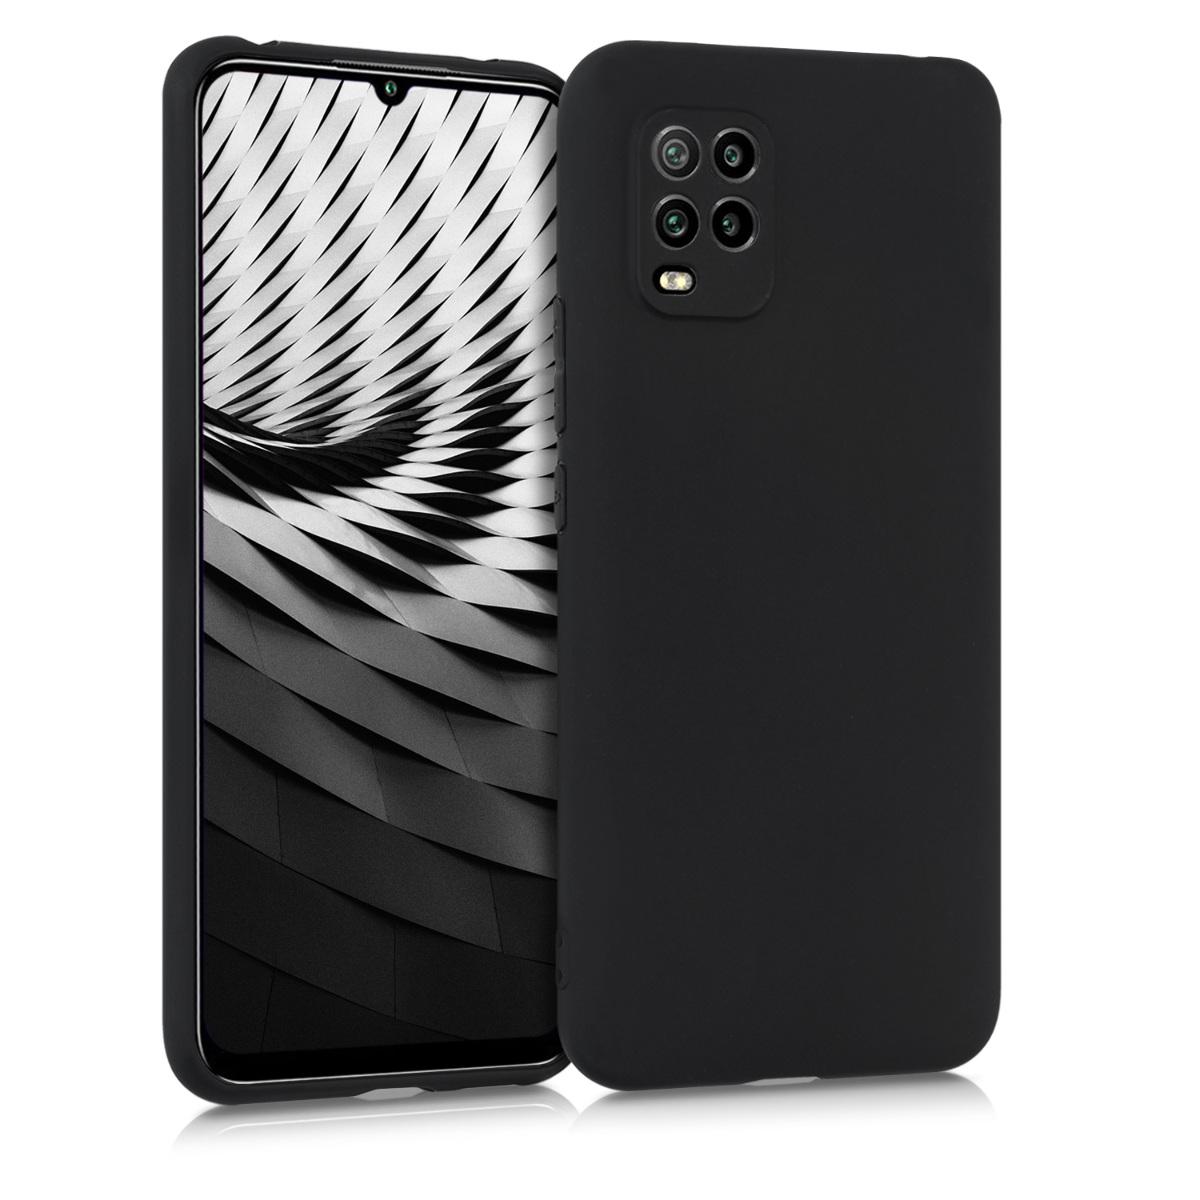 Matné černé silikonové pouzdro / obal pro Xiaomi Mi 10 Lite